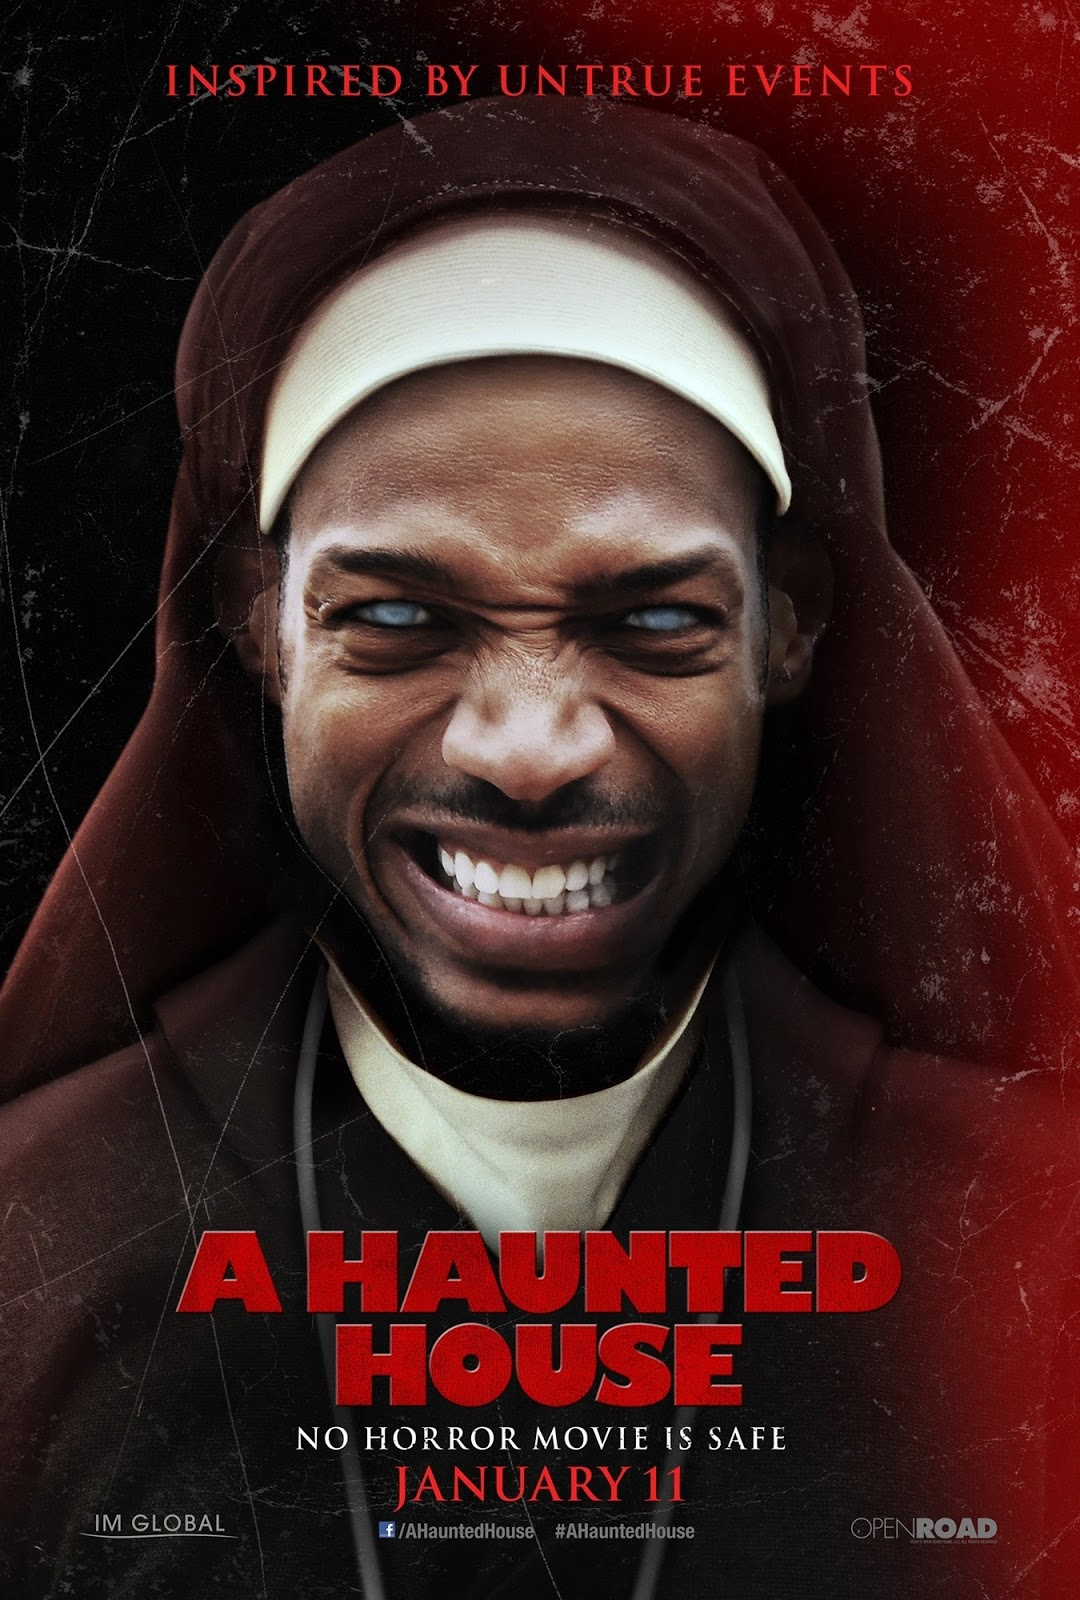 http://1.bp.blogspot.com/-q1oSM4zAGW8/UOqtiYOhUhI/AAAAAAAACtY/3U9oT1F91k0/s1600/a-haunted-house-poster02.jpg